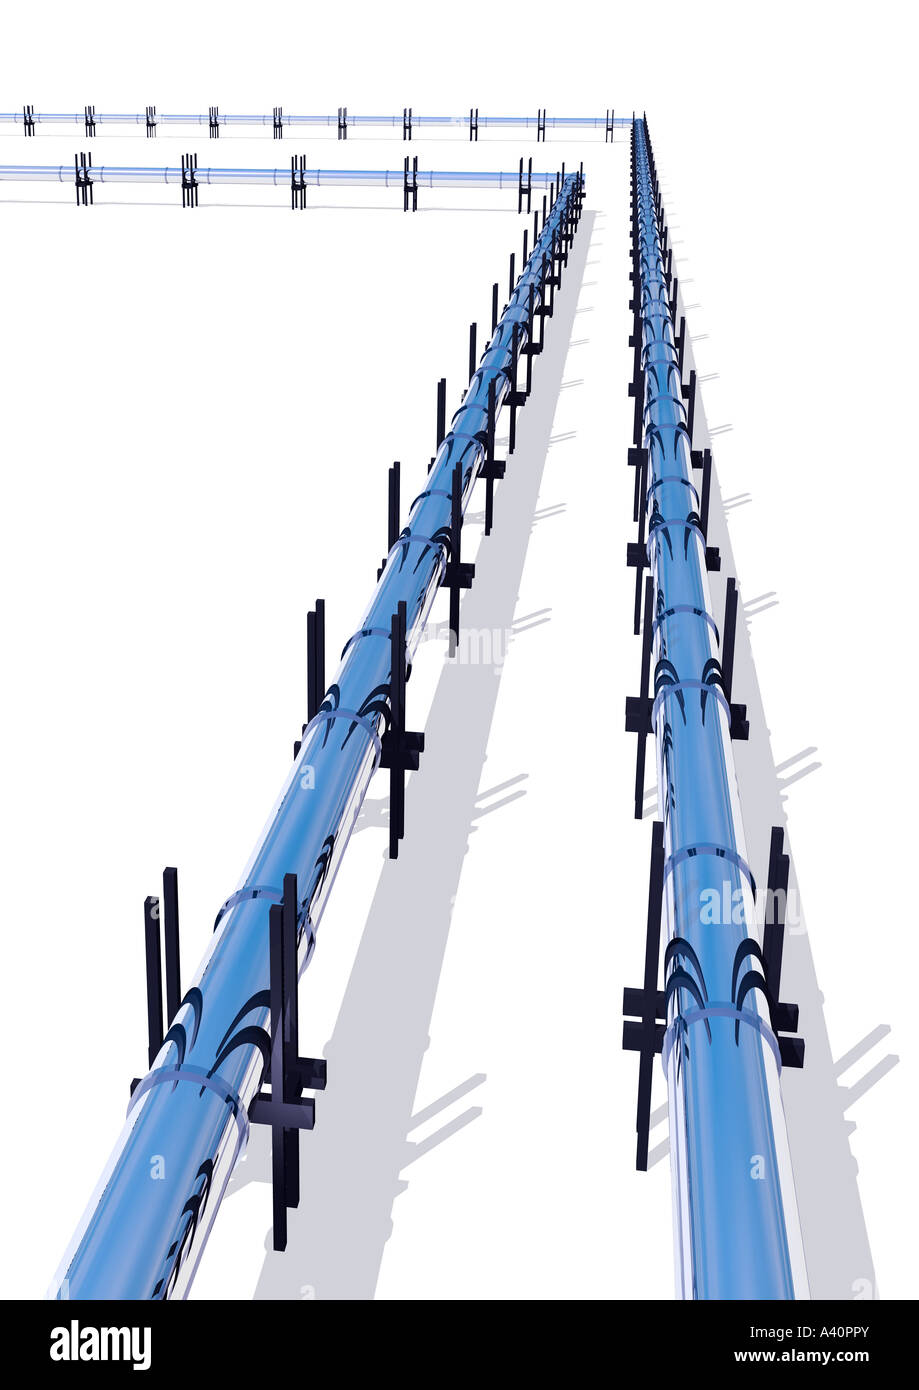 Gasdotti Immagini Stock